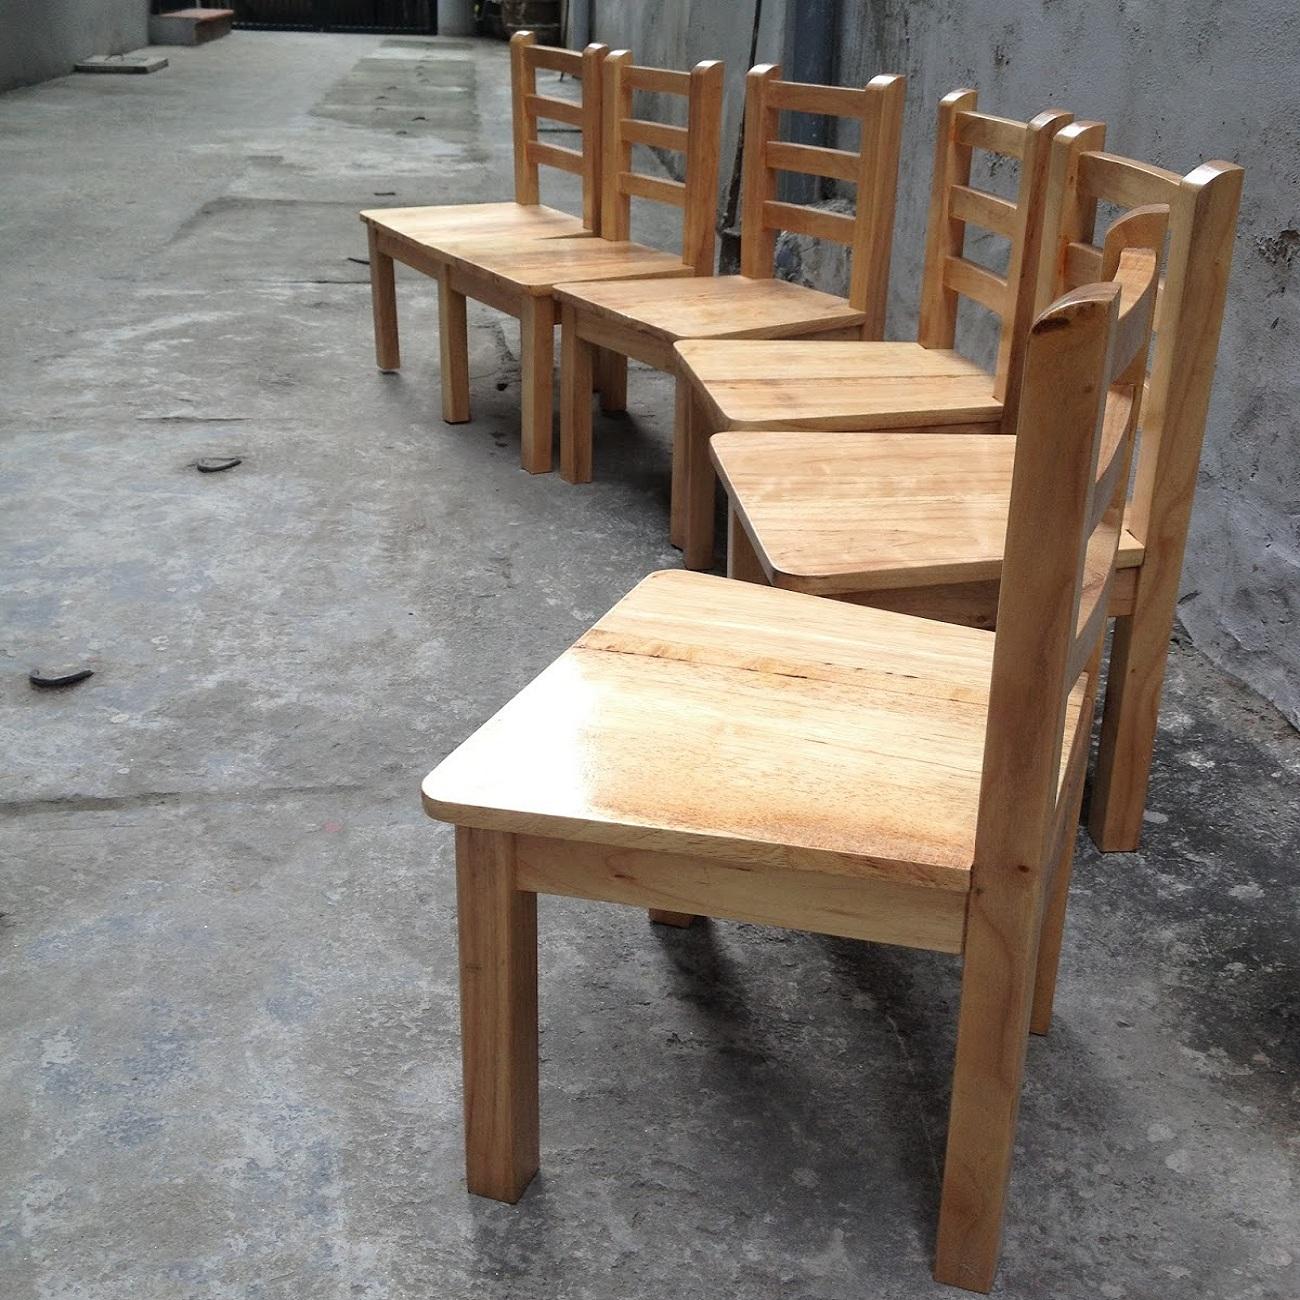 Ghế gỗ mầm  non mẫu mới